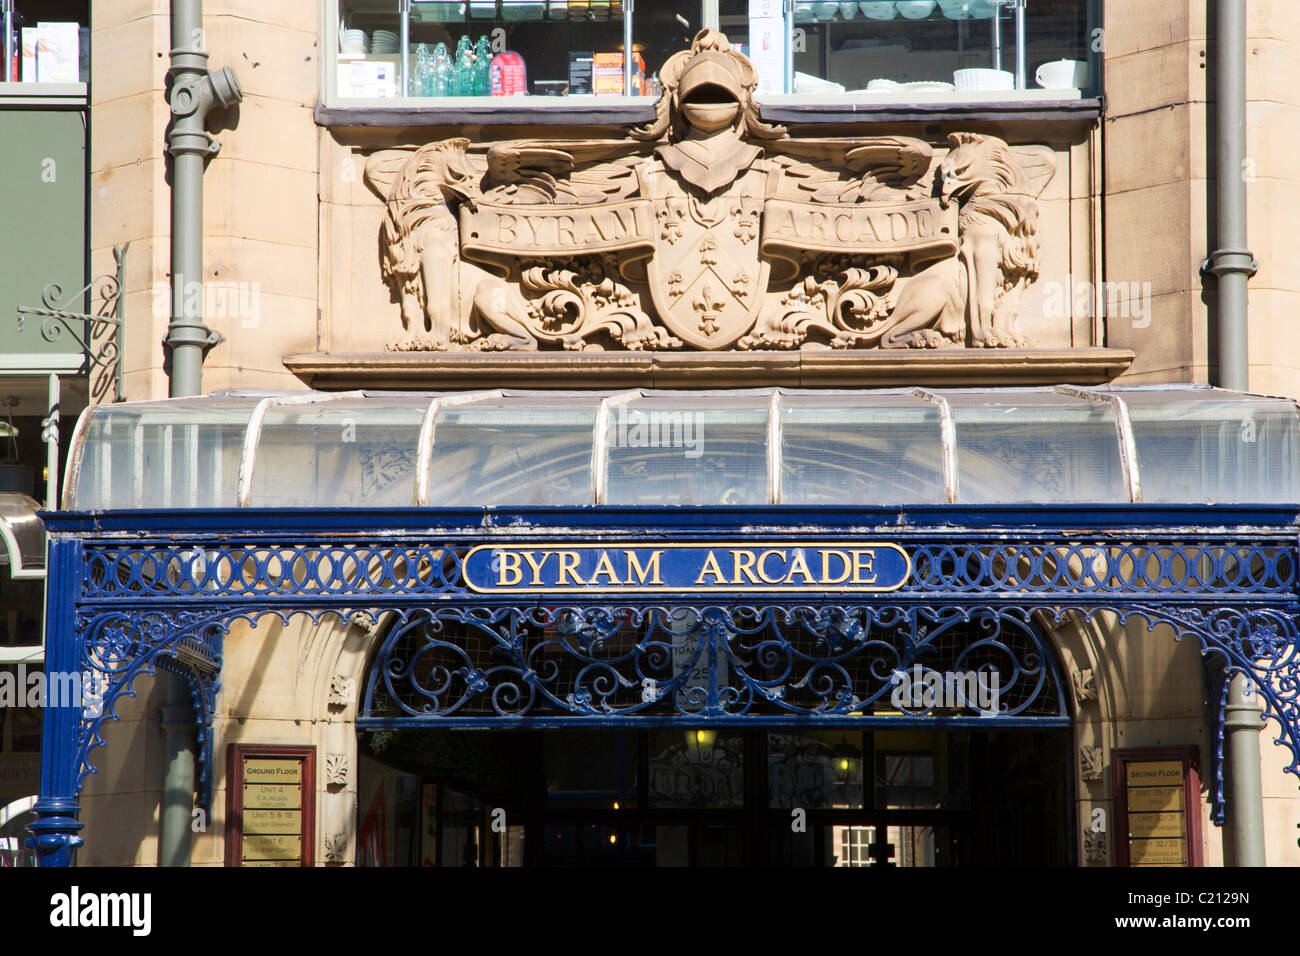 Byram Arcade Huddersfield West Yorkshire England - Stock Image